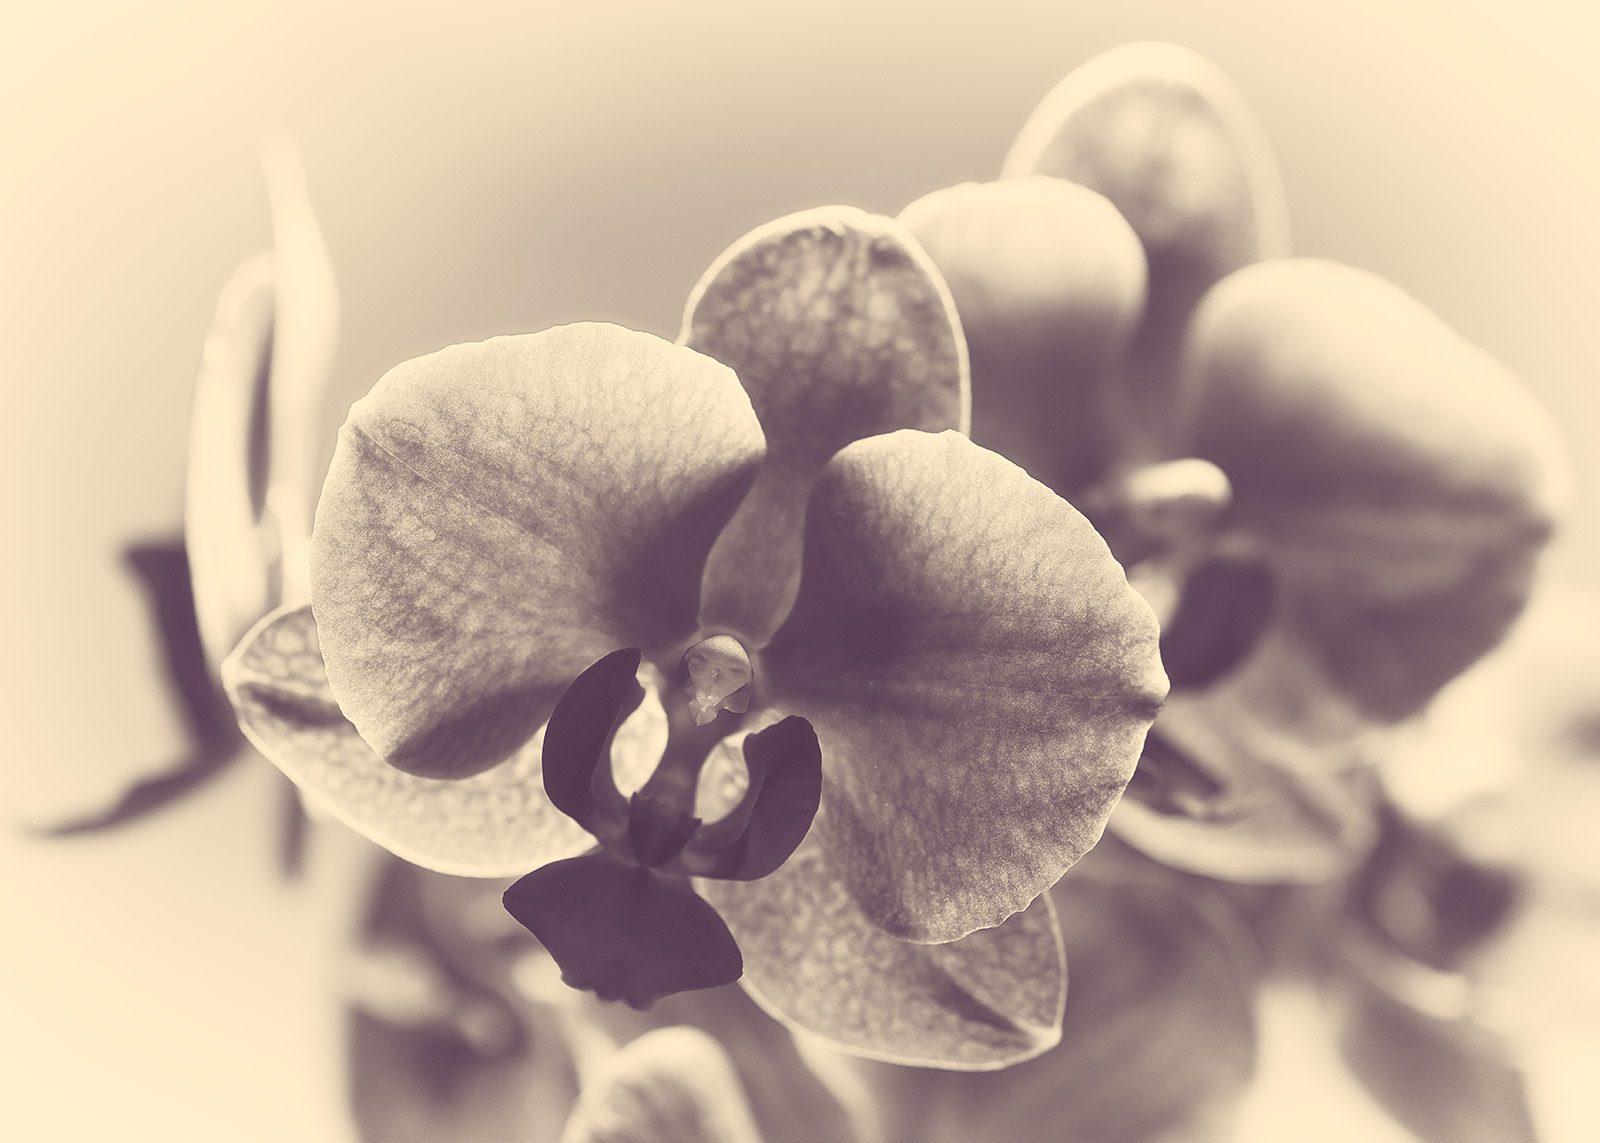 Retro orkide av Peder Aaserud Eikeland